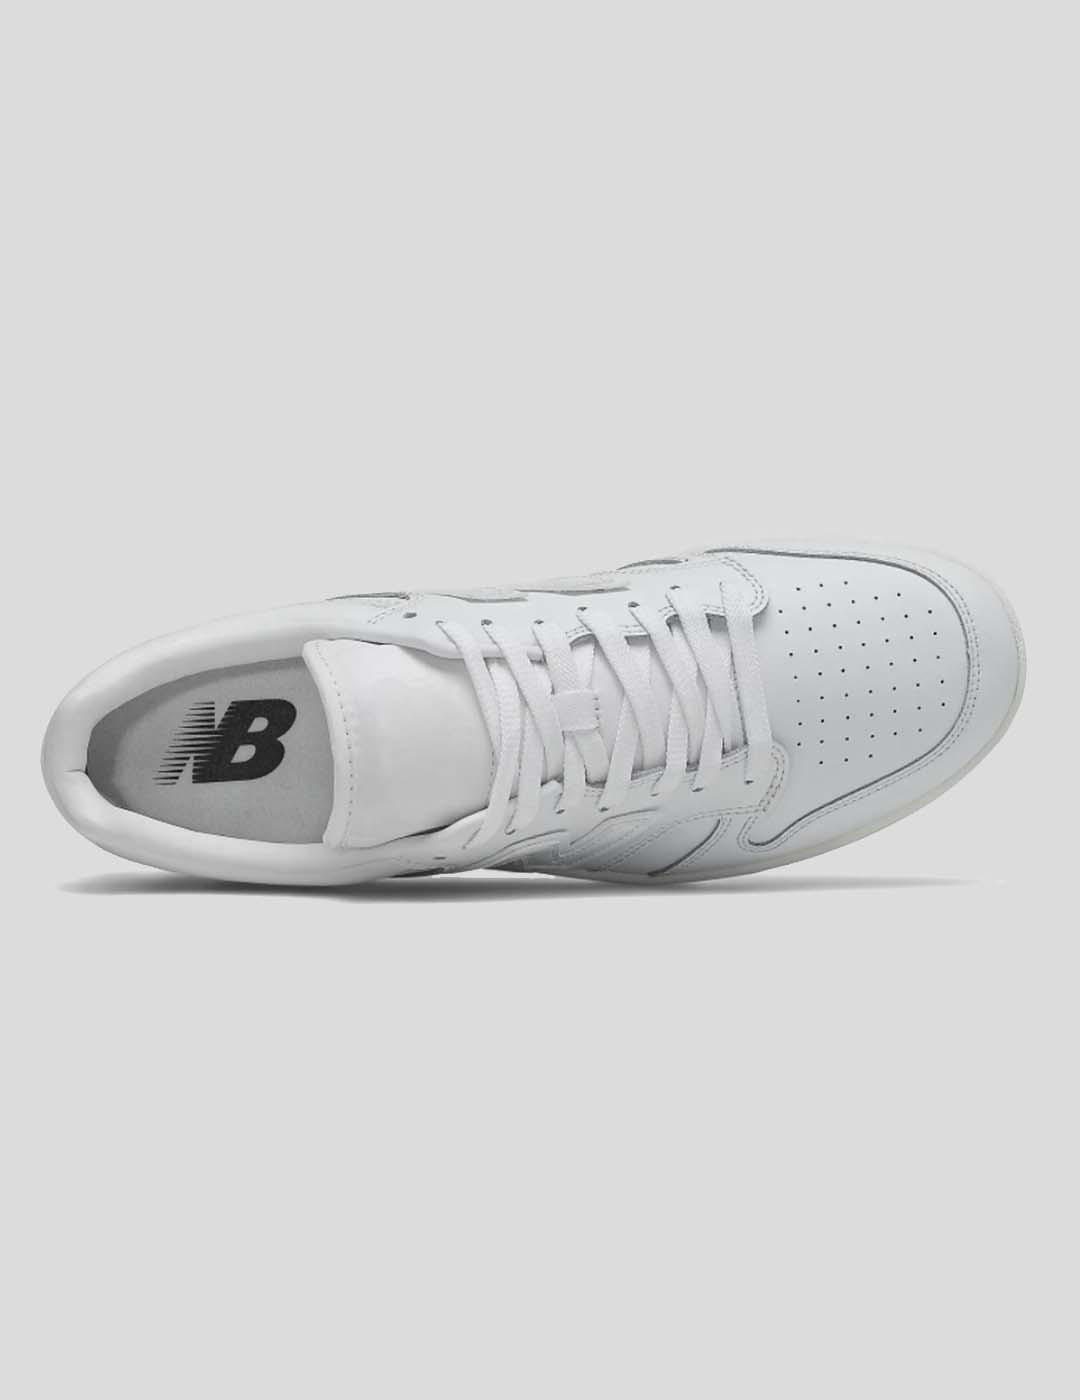 ZAPATILLAS NEW BALANCE BB480 WHITE